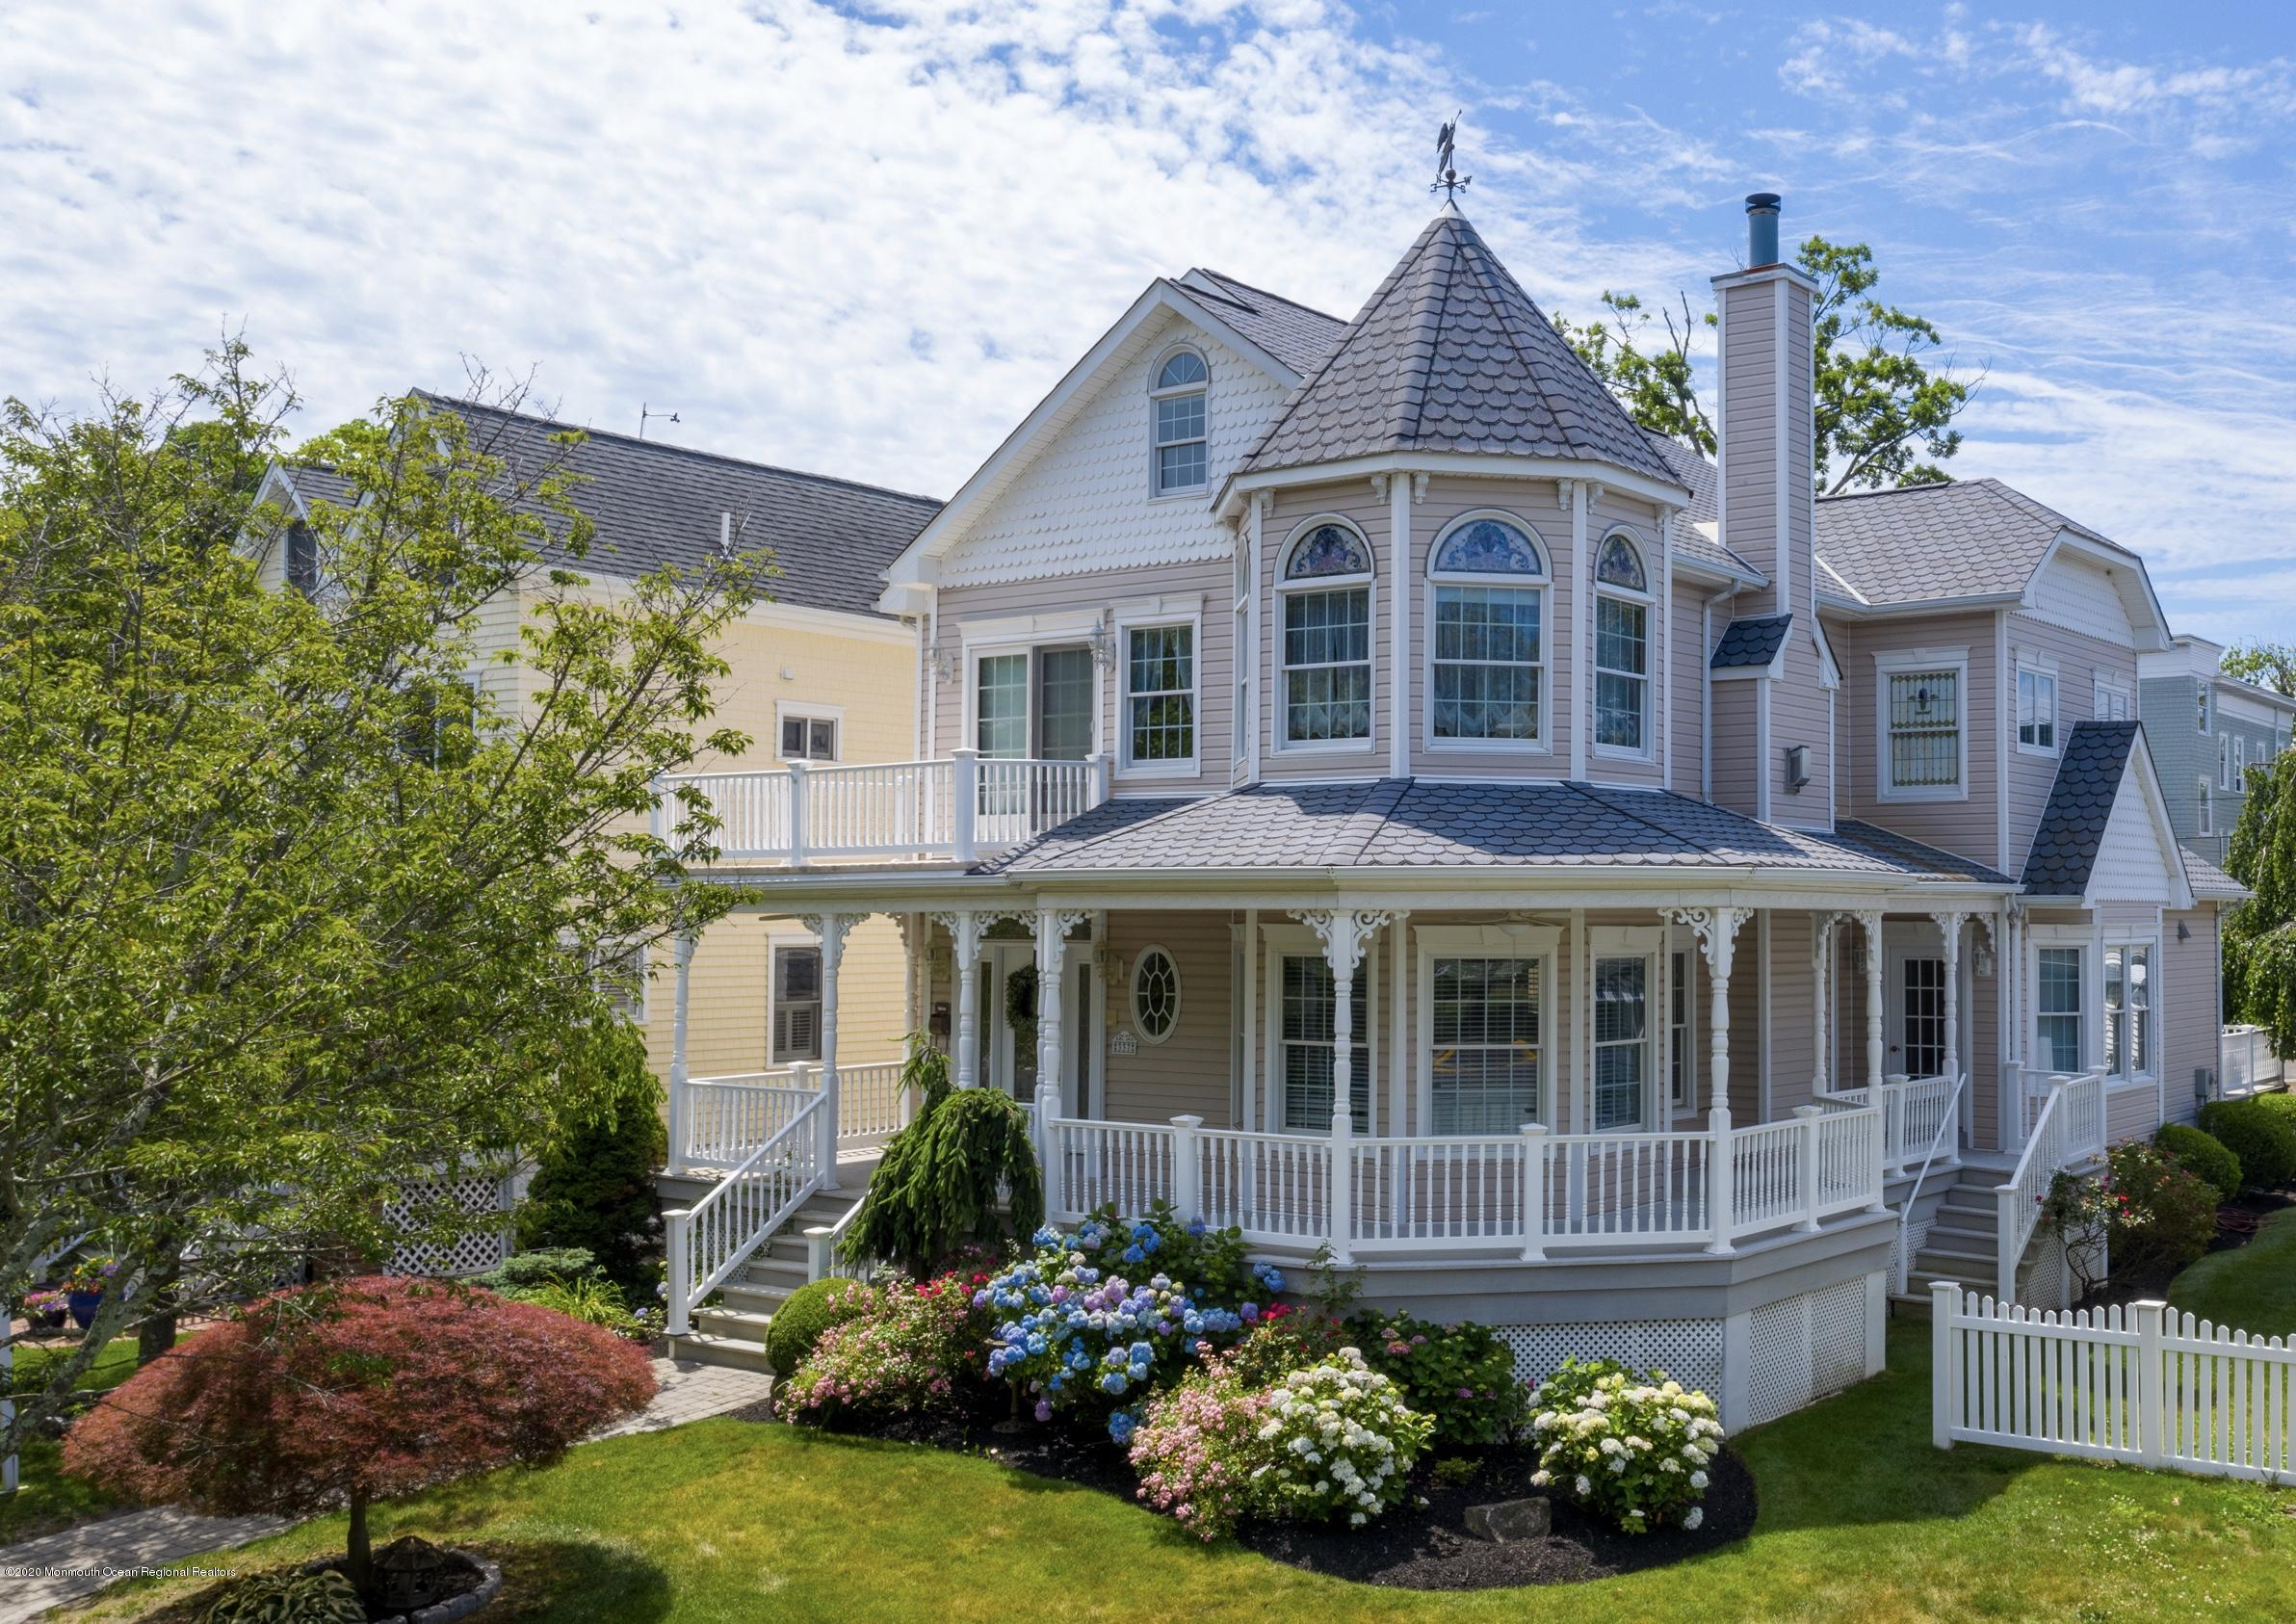 Photo of 337 Woodland Avenue, Avon-by-the-sea, NJ 07717